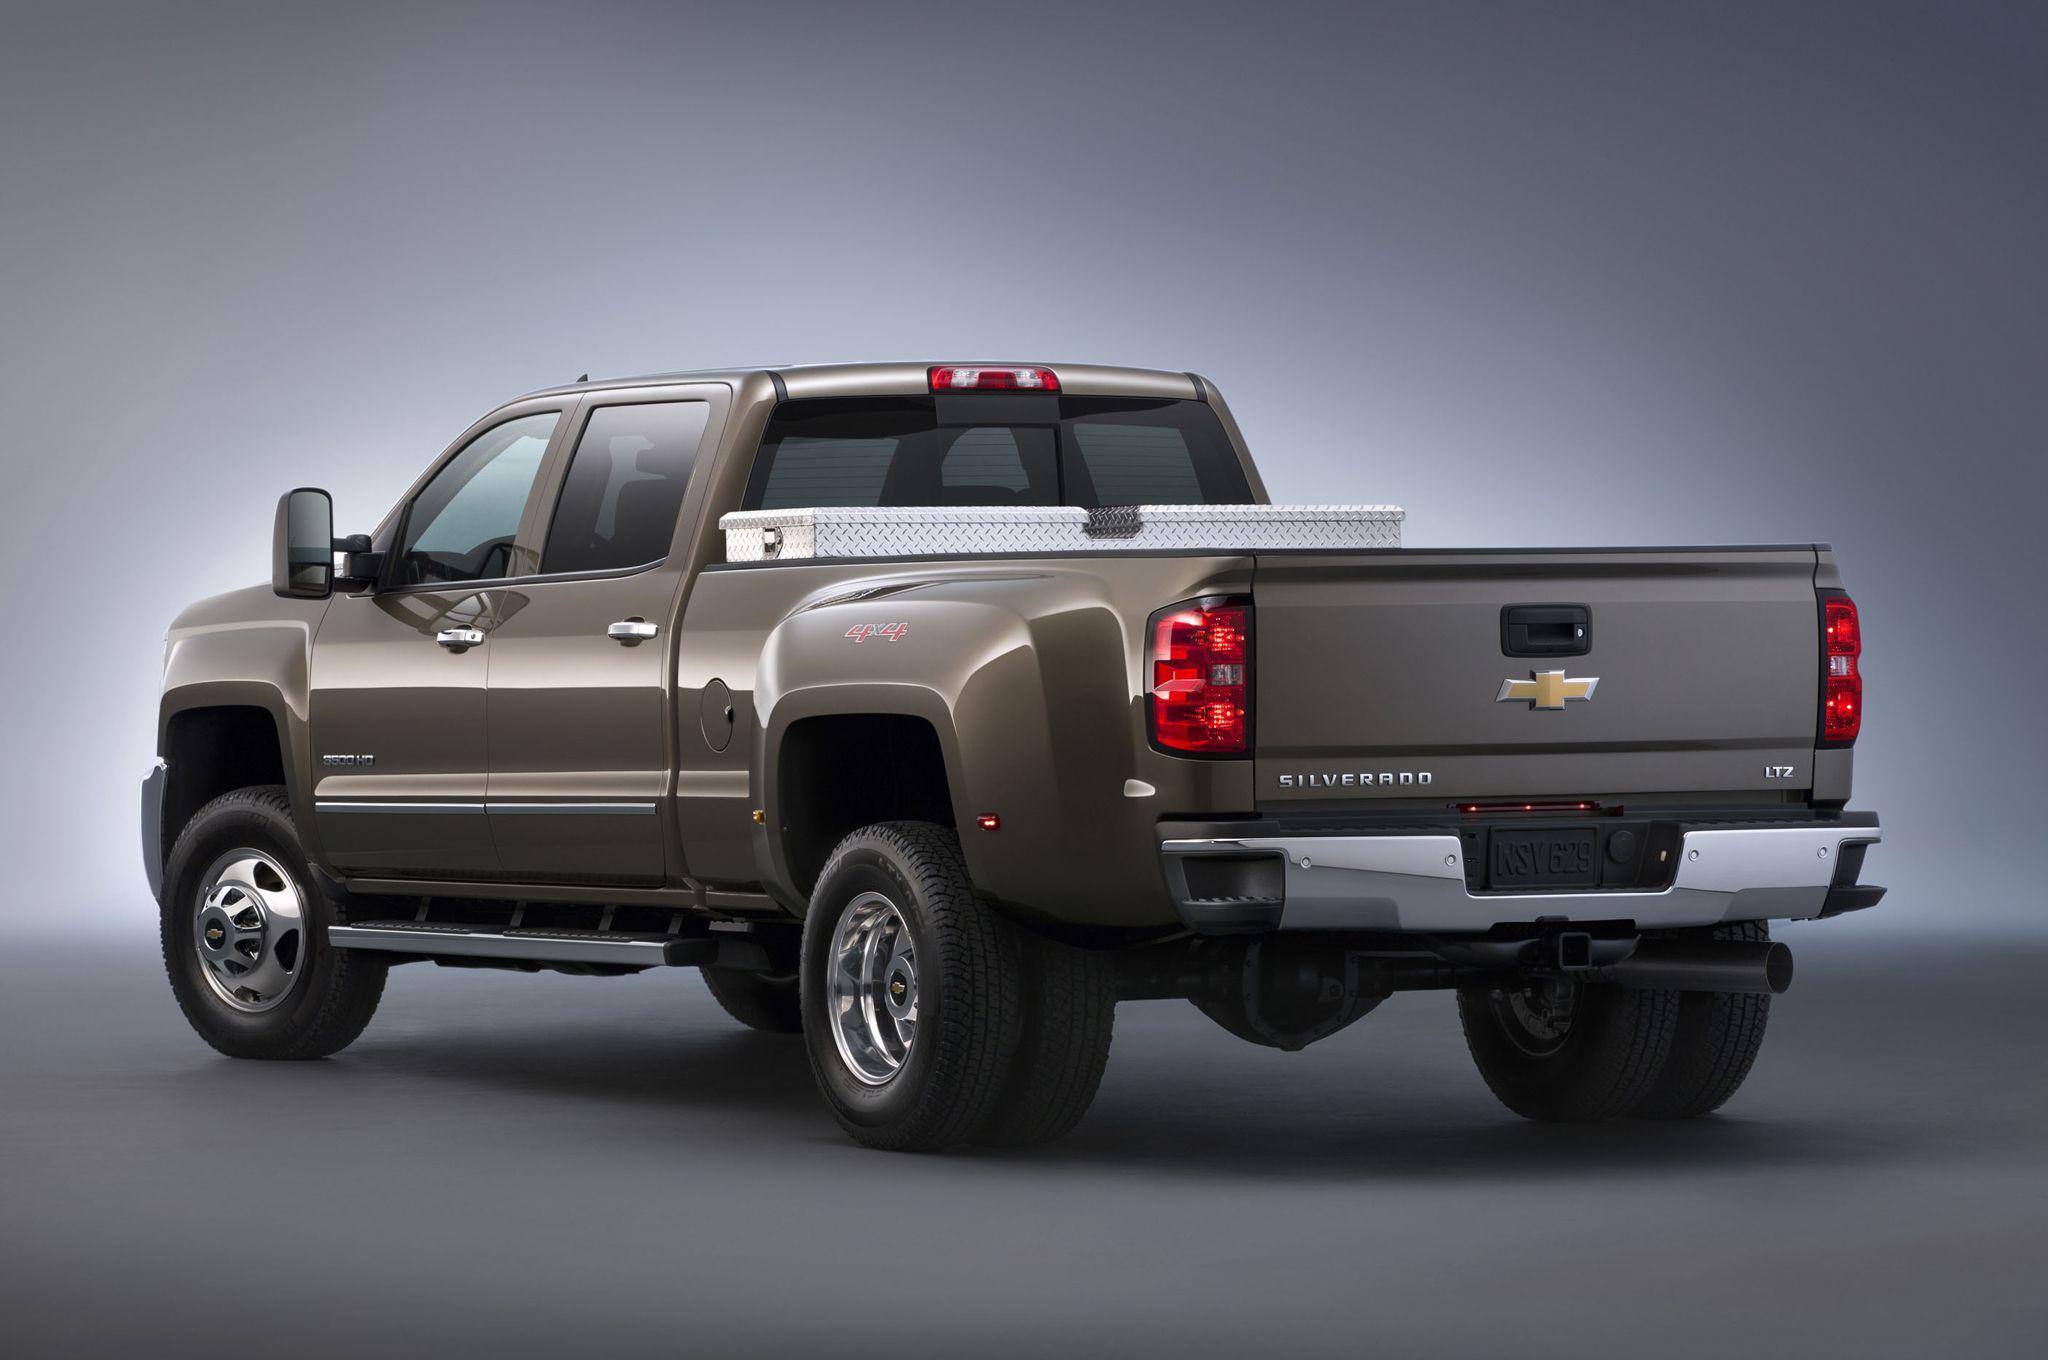 2015 chevy truck 2015 chevrolet silverado hd 2015 gmc sierra hd photo gallery